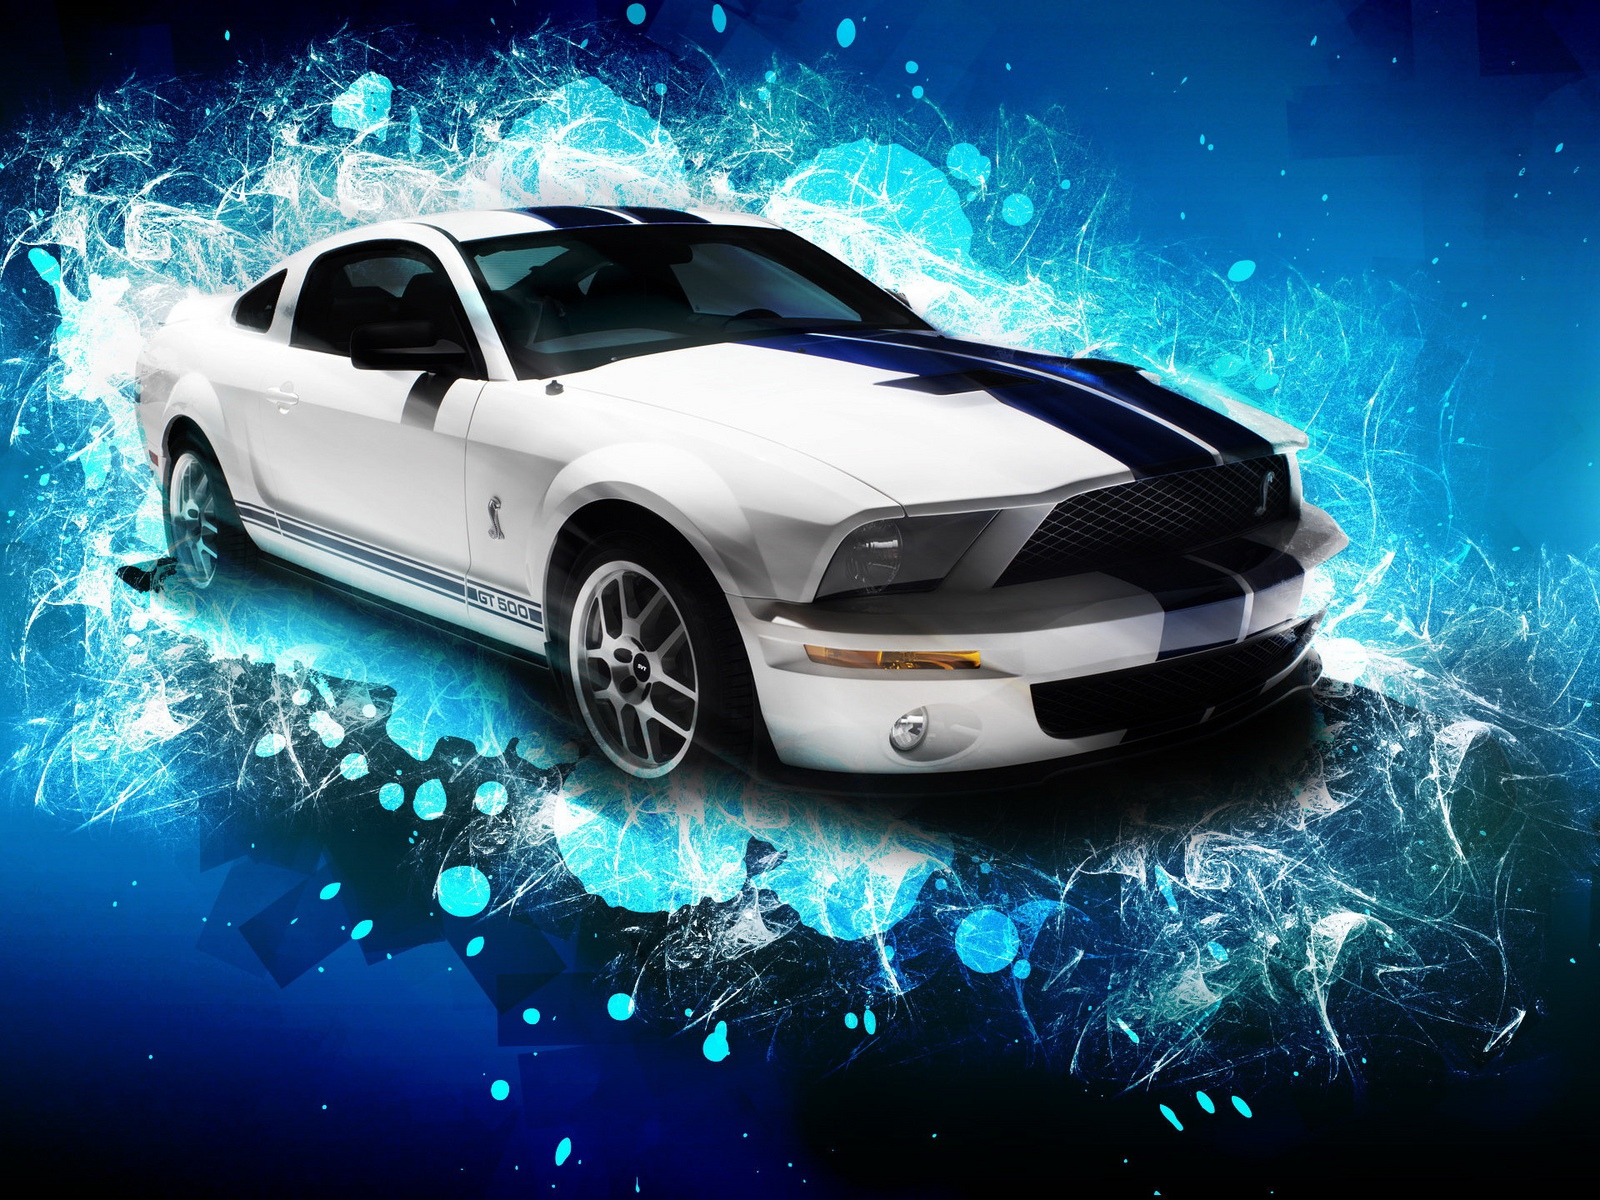 Hd Car wallpapers   Cool Car Wallpapers